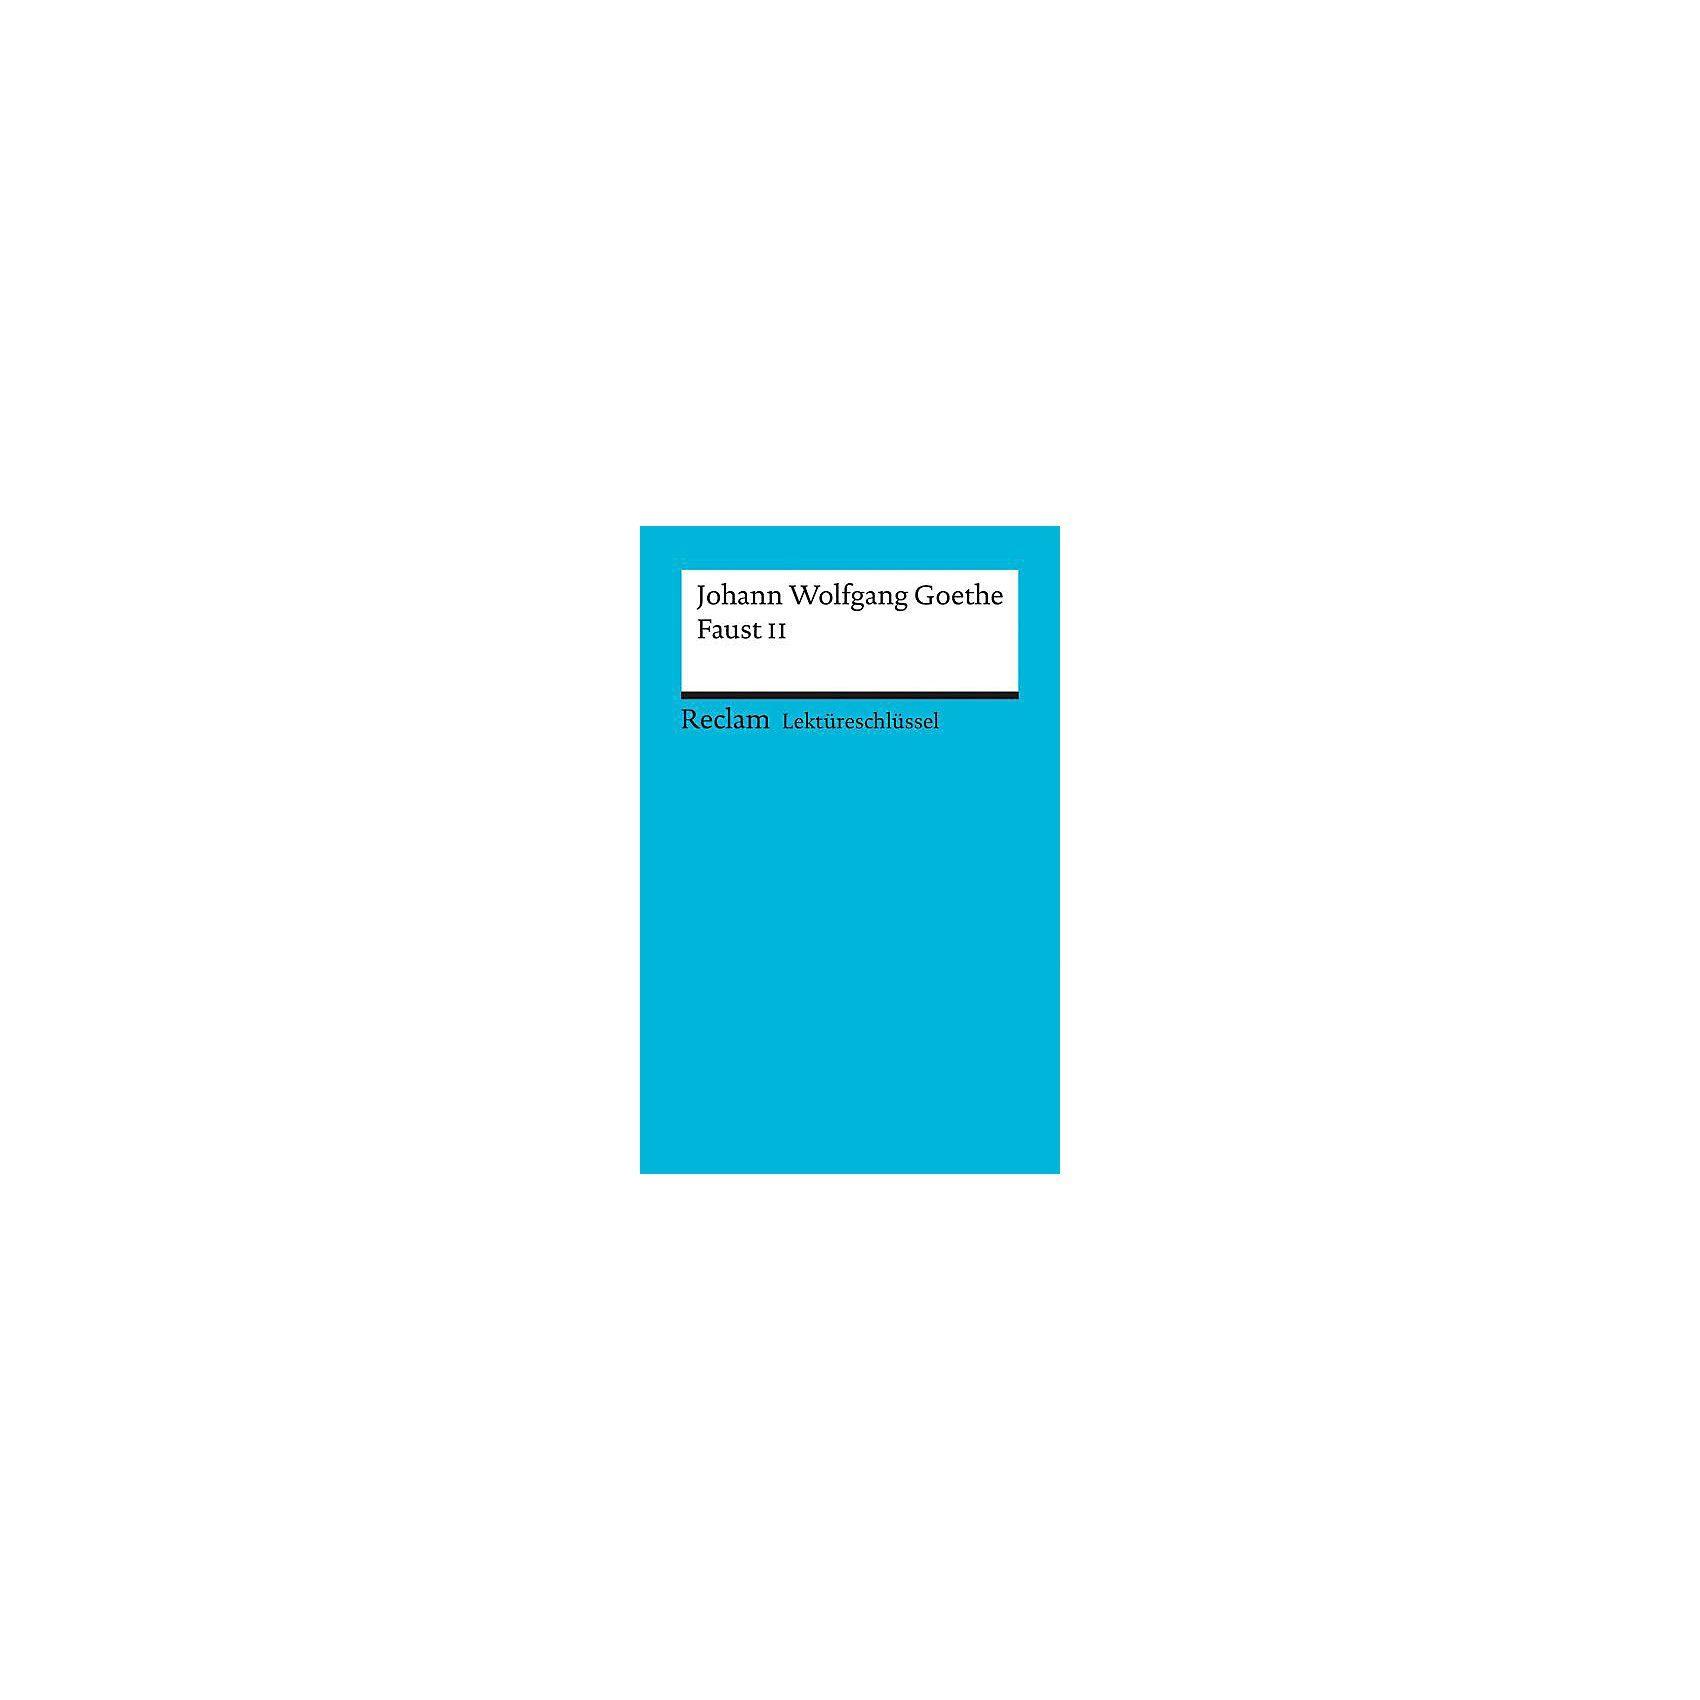 Schicker TANKINI blau-schwarz-cyclam-gelb-türkis Gr.40 44 52 56 58 CUP D NEU